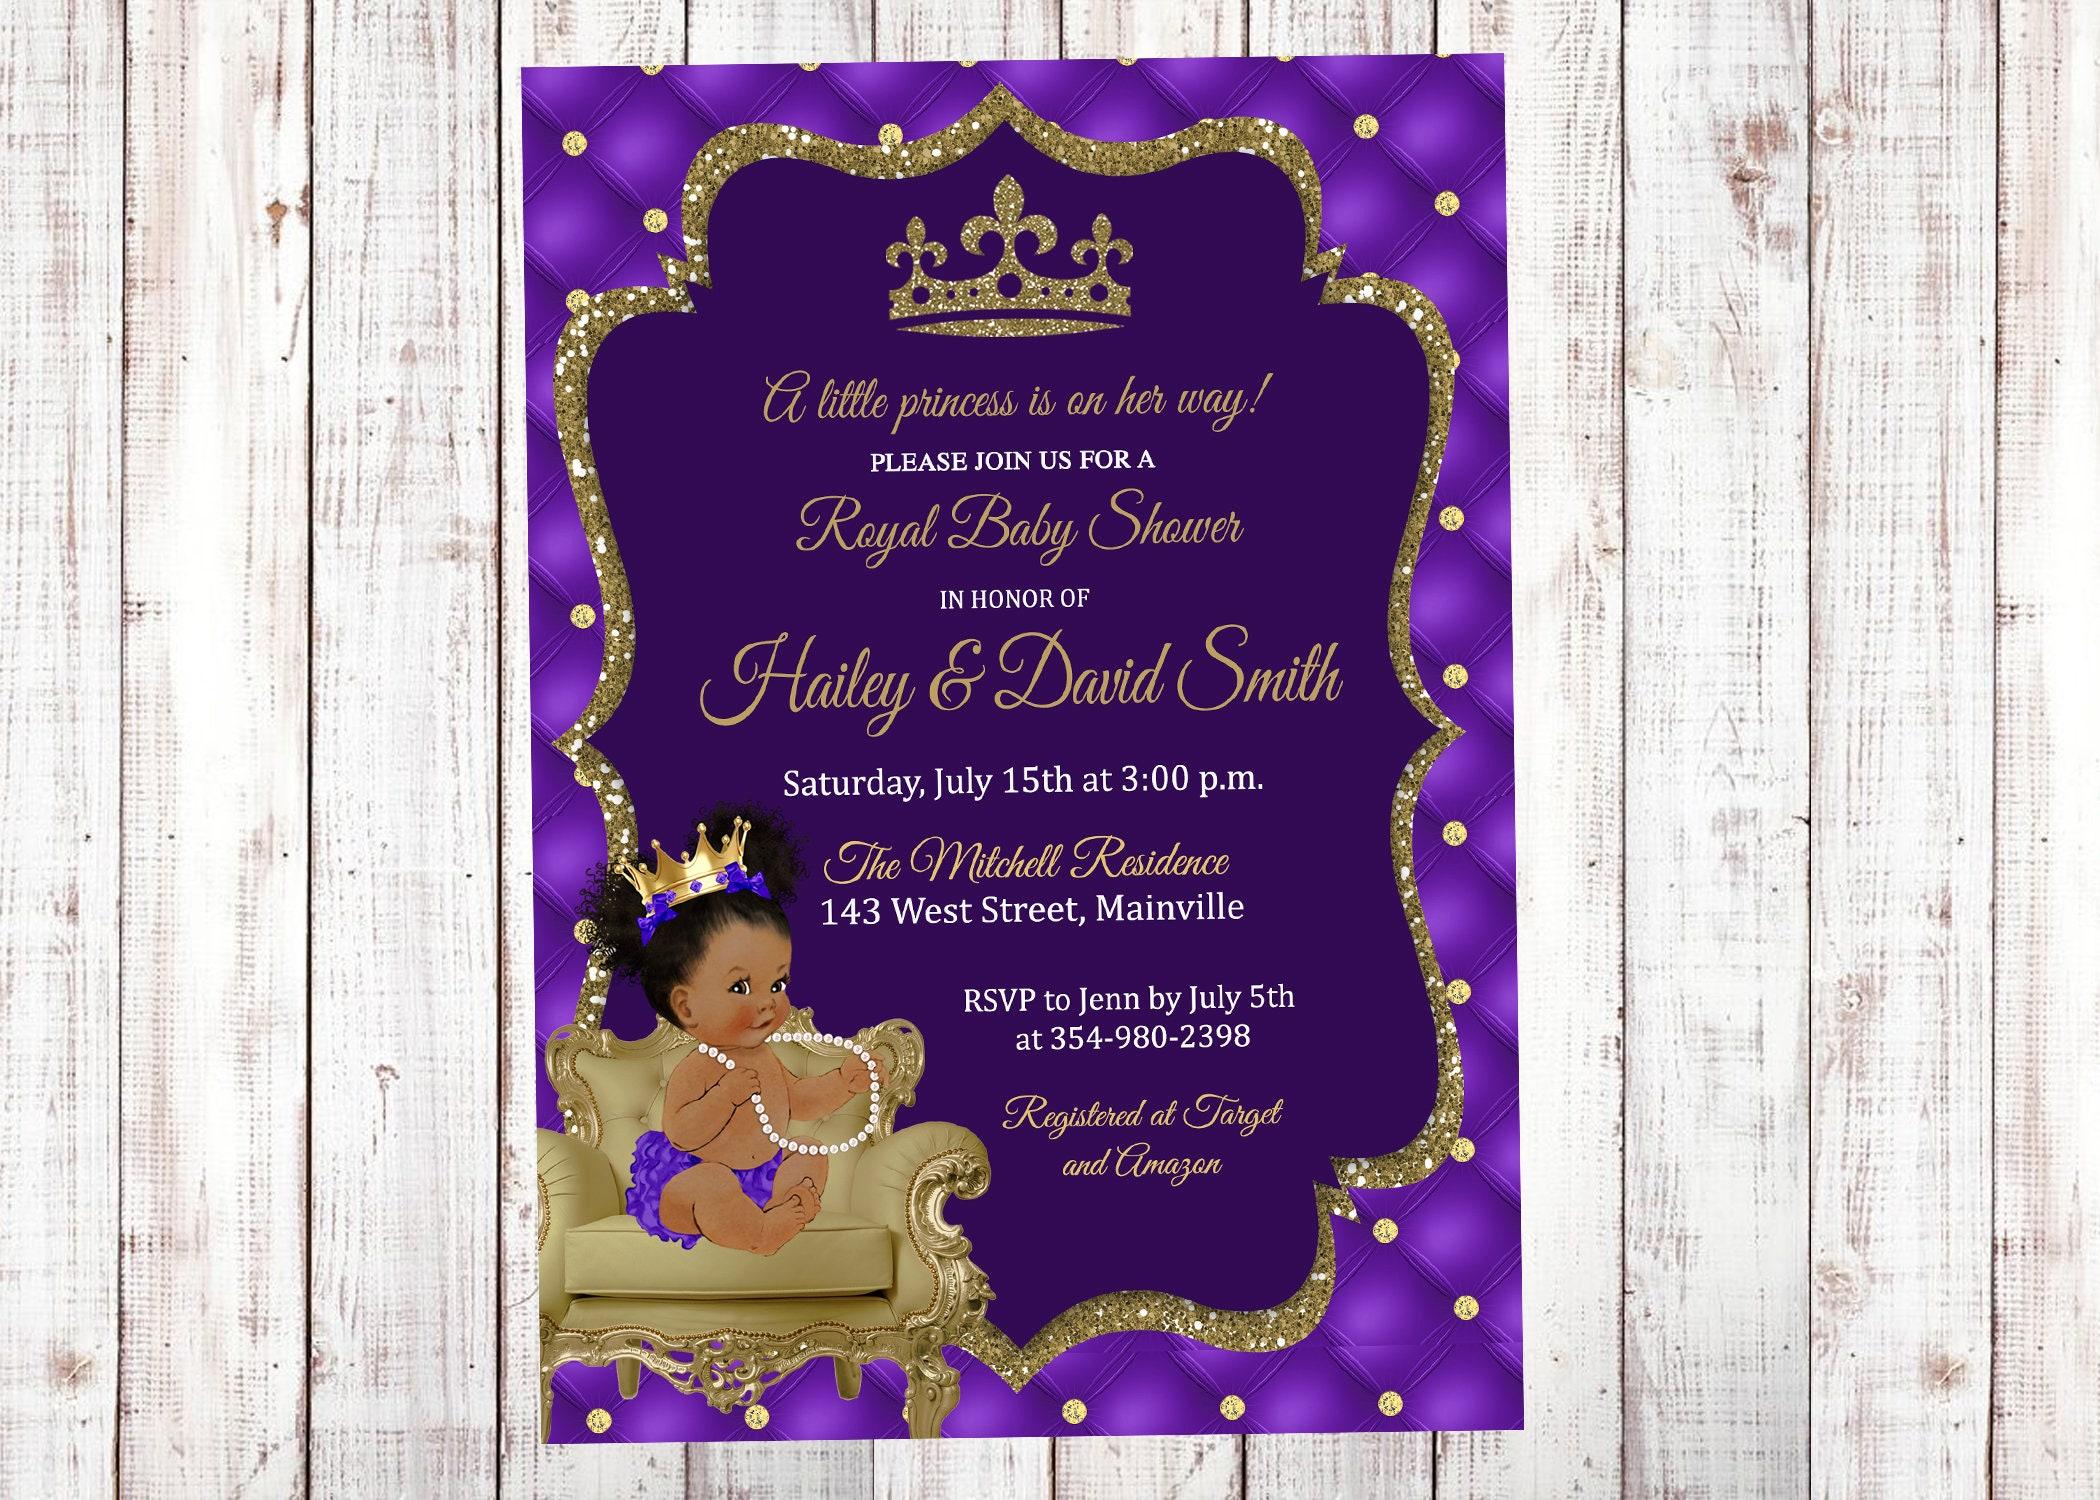 Princess Baby Shower Invitation Purple Lavender Gold   Etsy